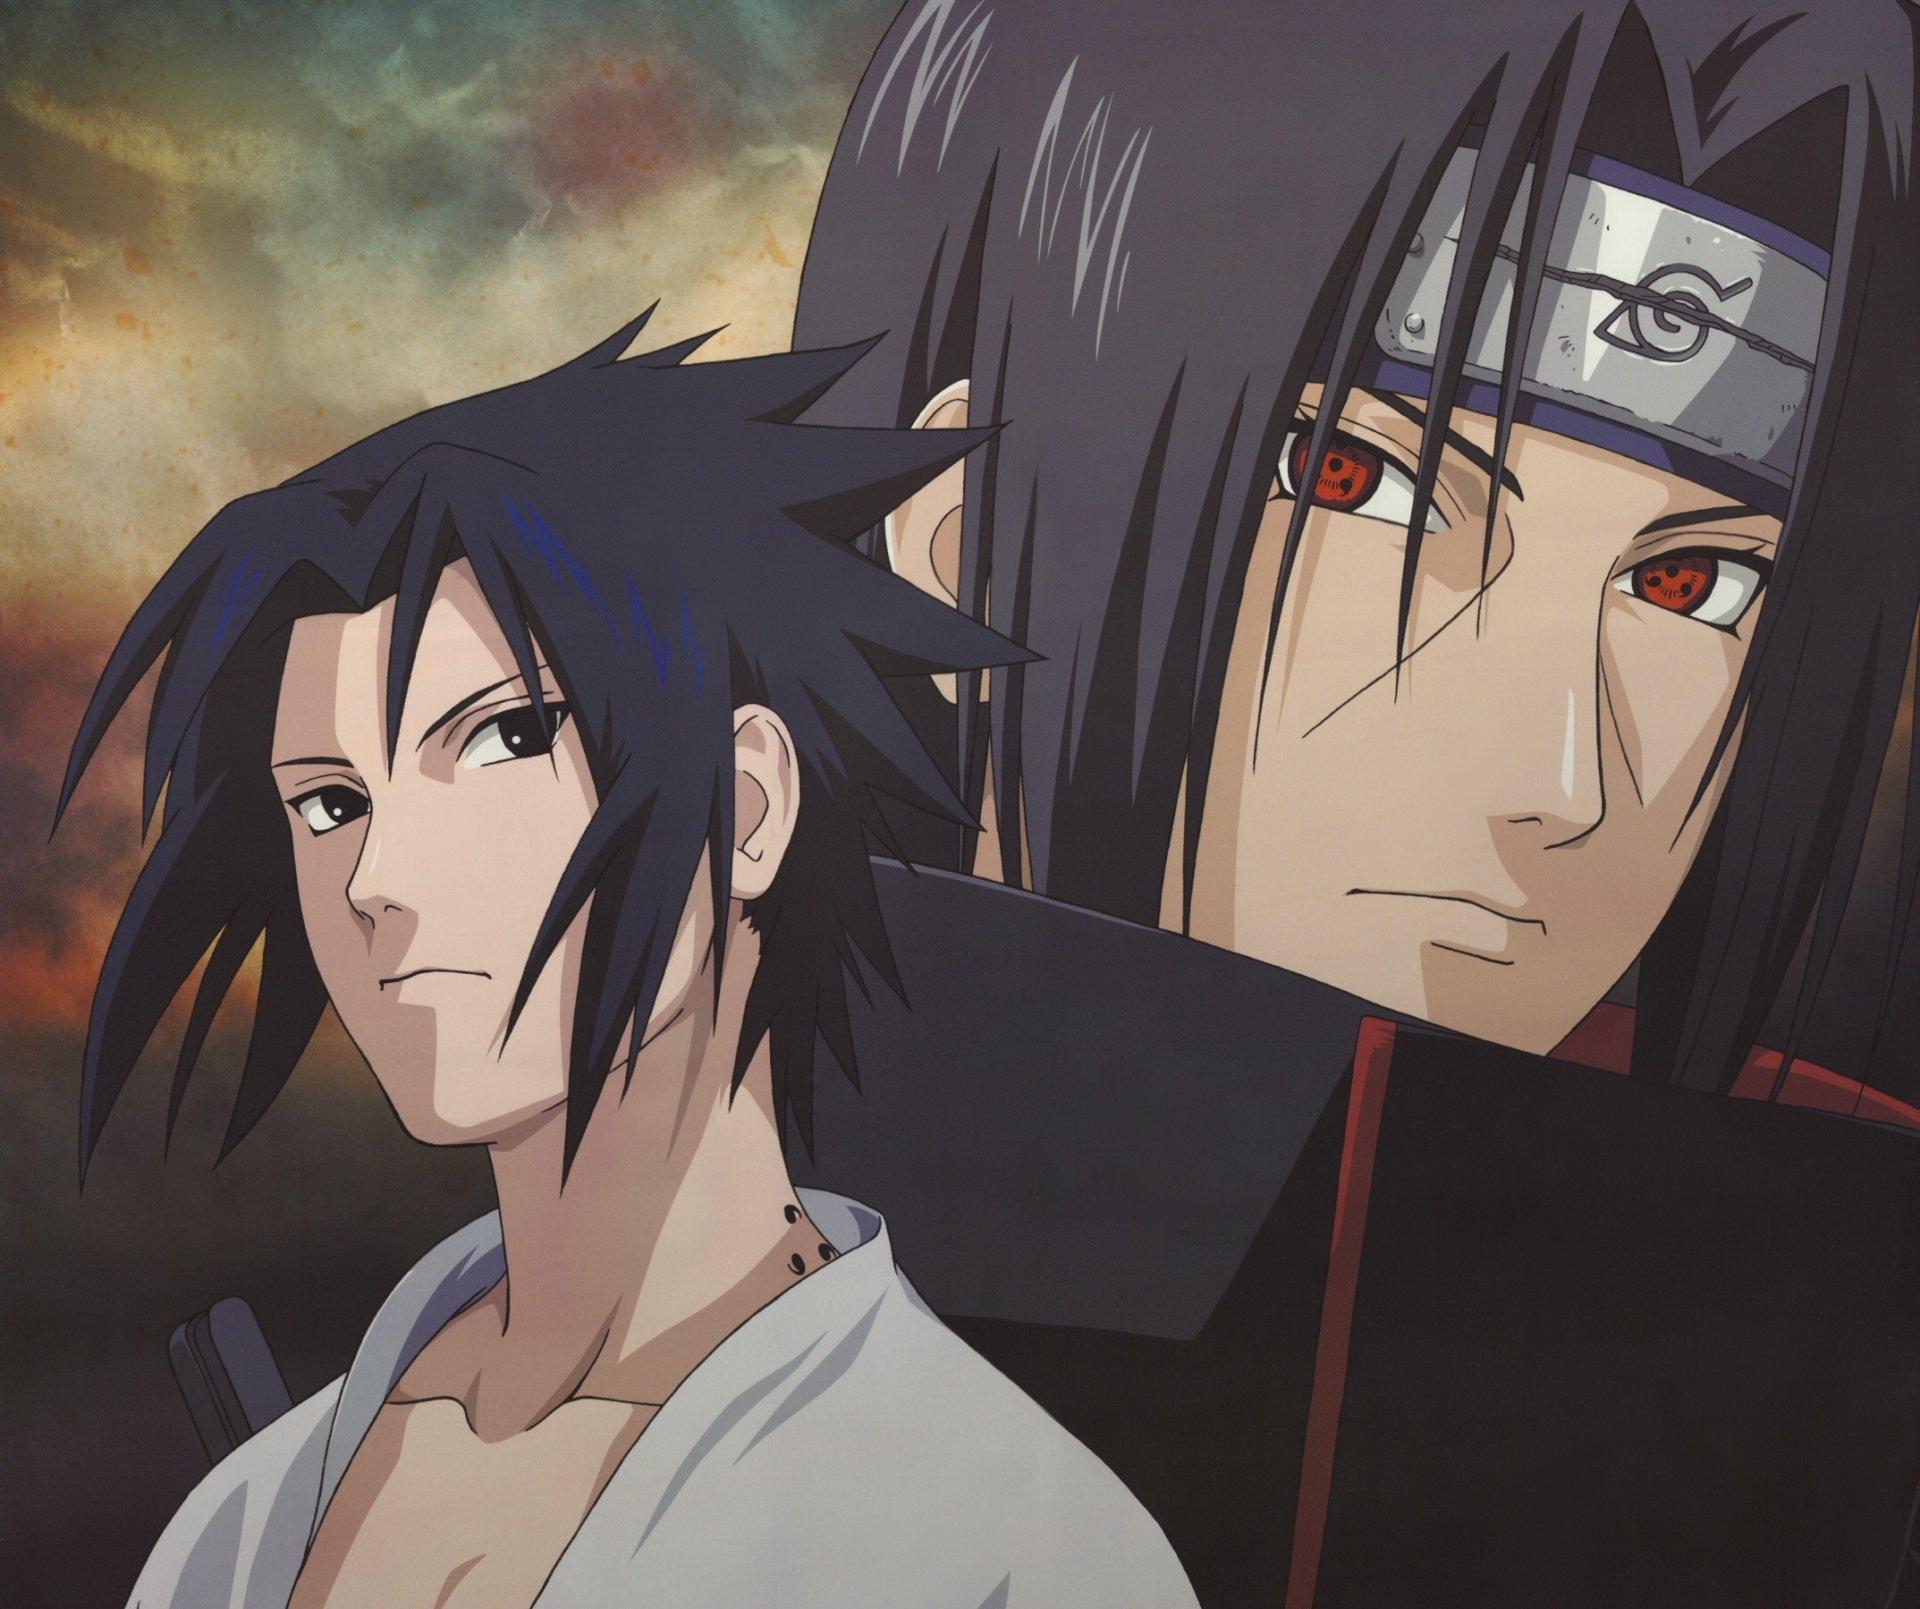 Sasuke and Itachi Uchiha Fond d'écran HD   Arrière-Plan   2147x1799   ID:644196 - Wallpaper Abyss